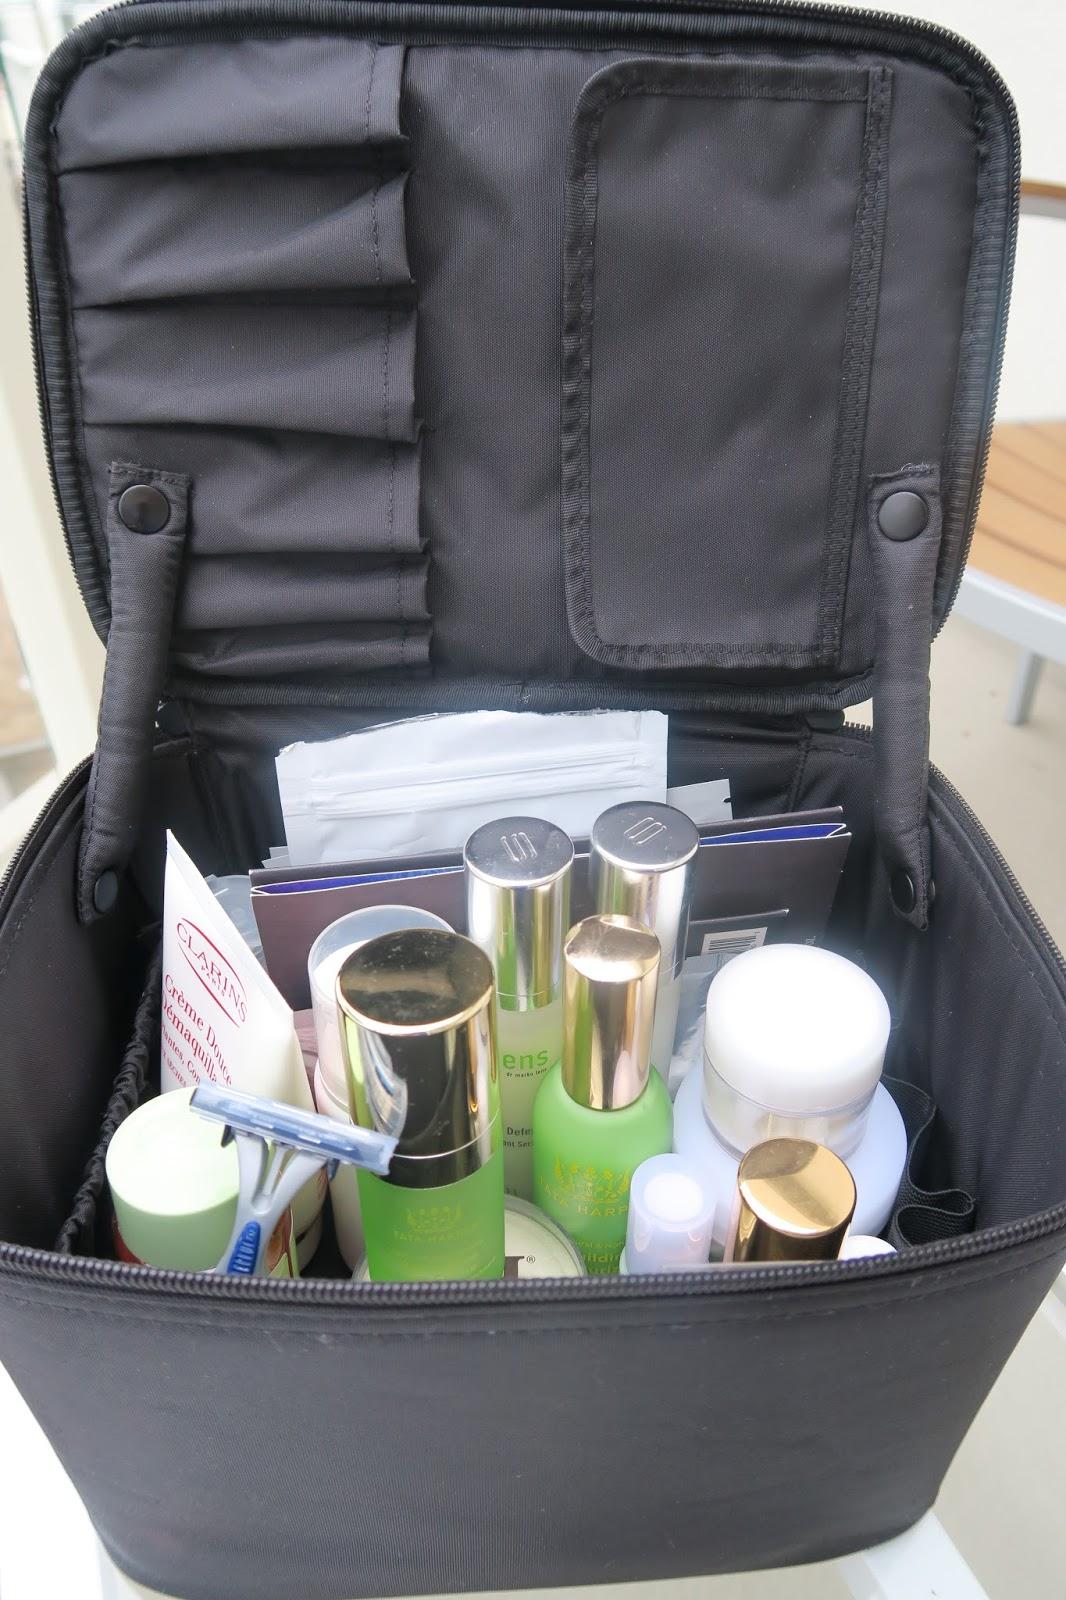 My Travel Skincare Kit Caroline Hirons